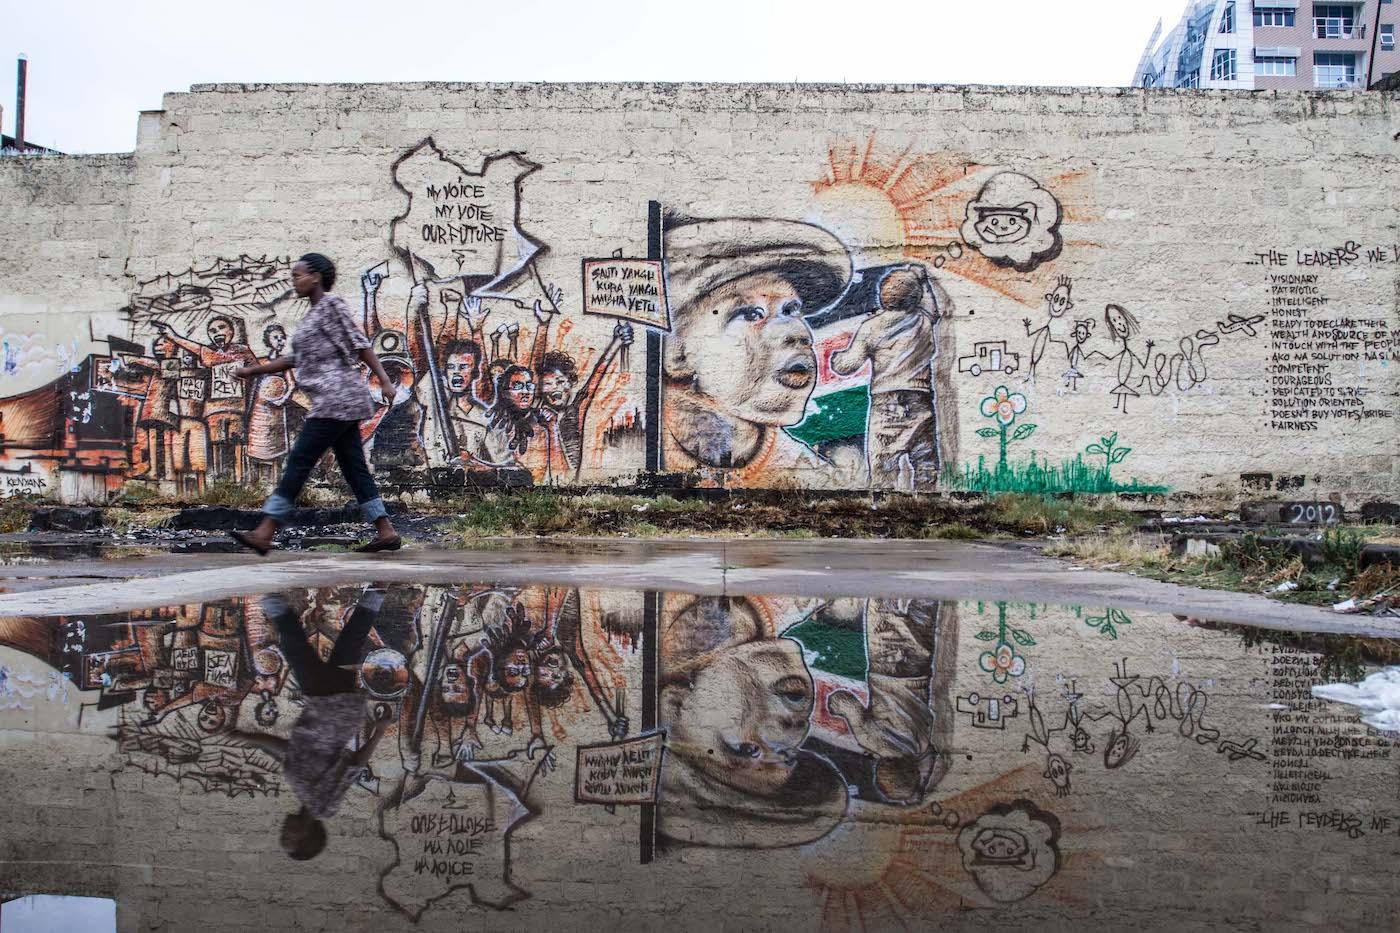 Street Scene with Graffiti by Mwangi Kirubi